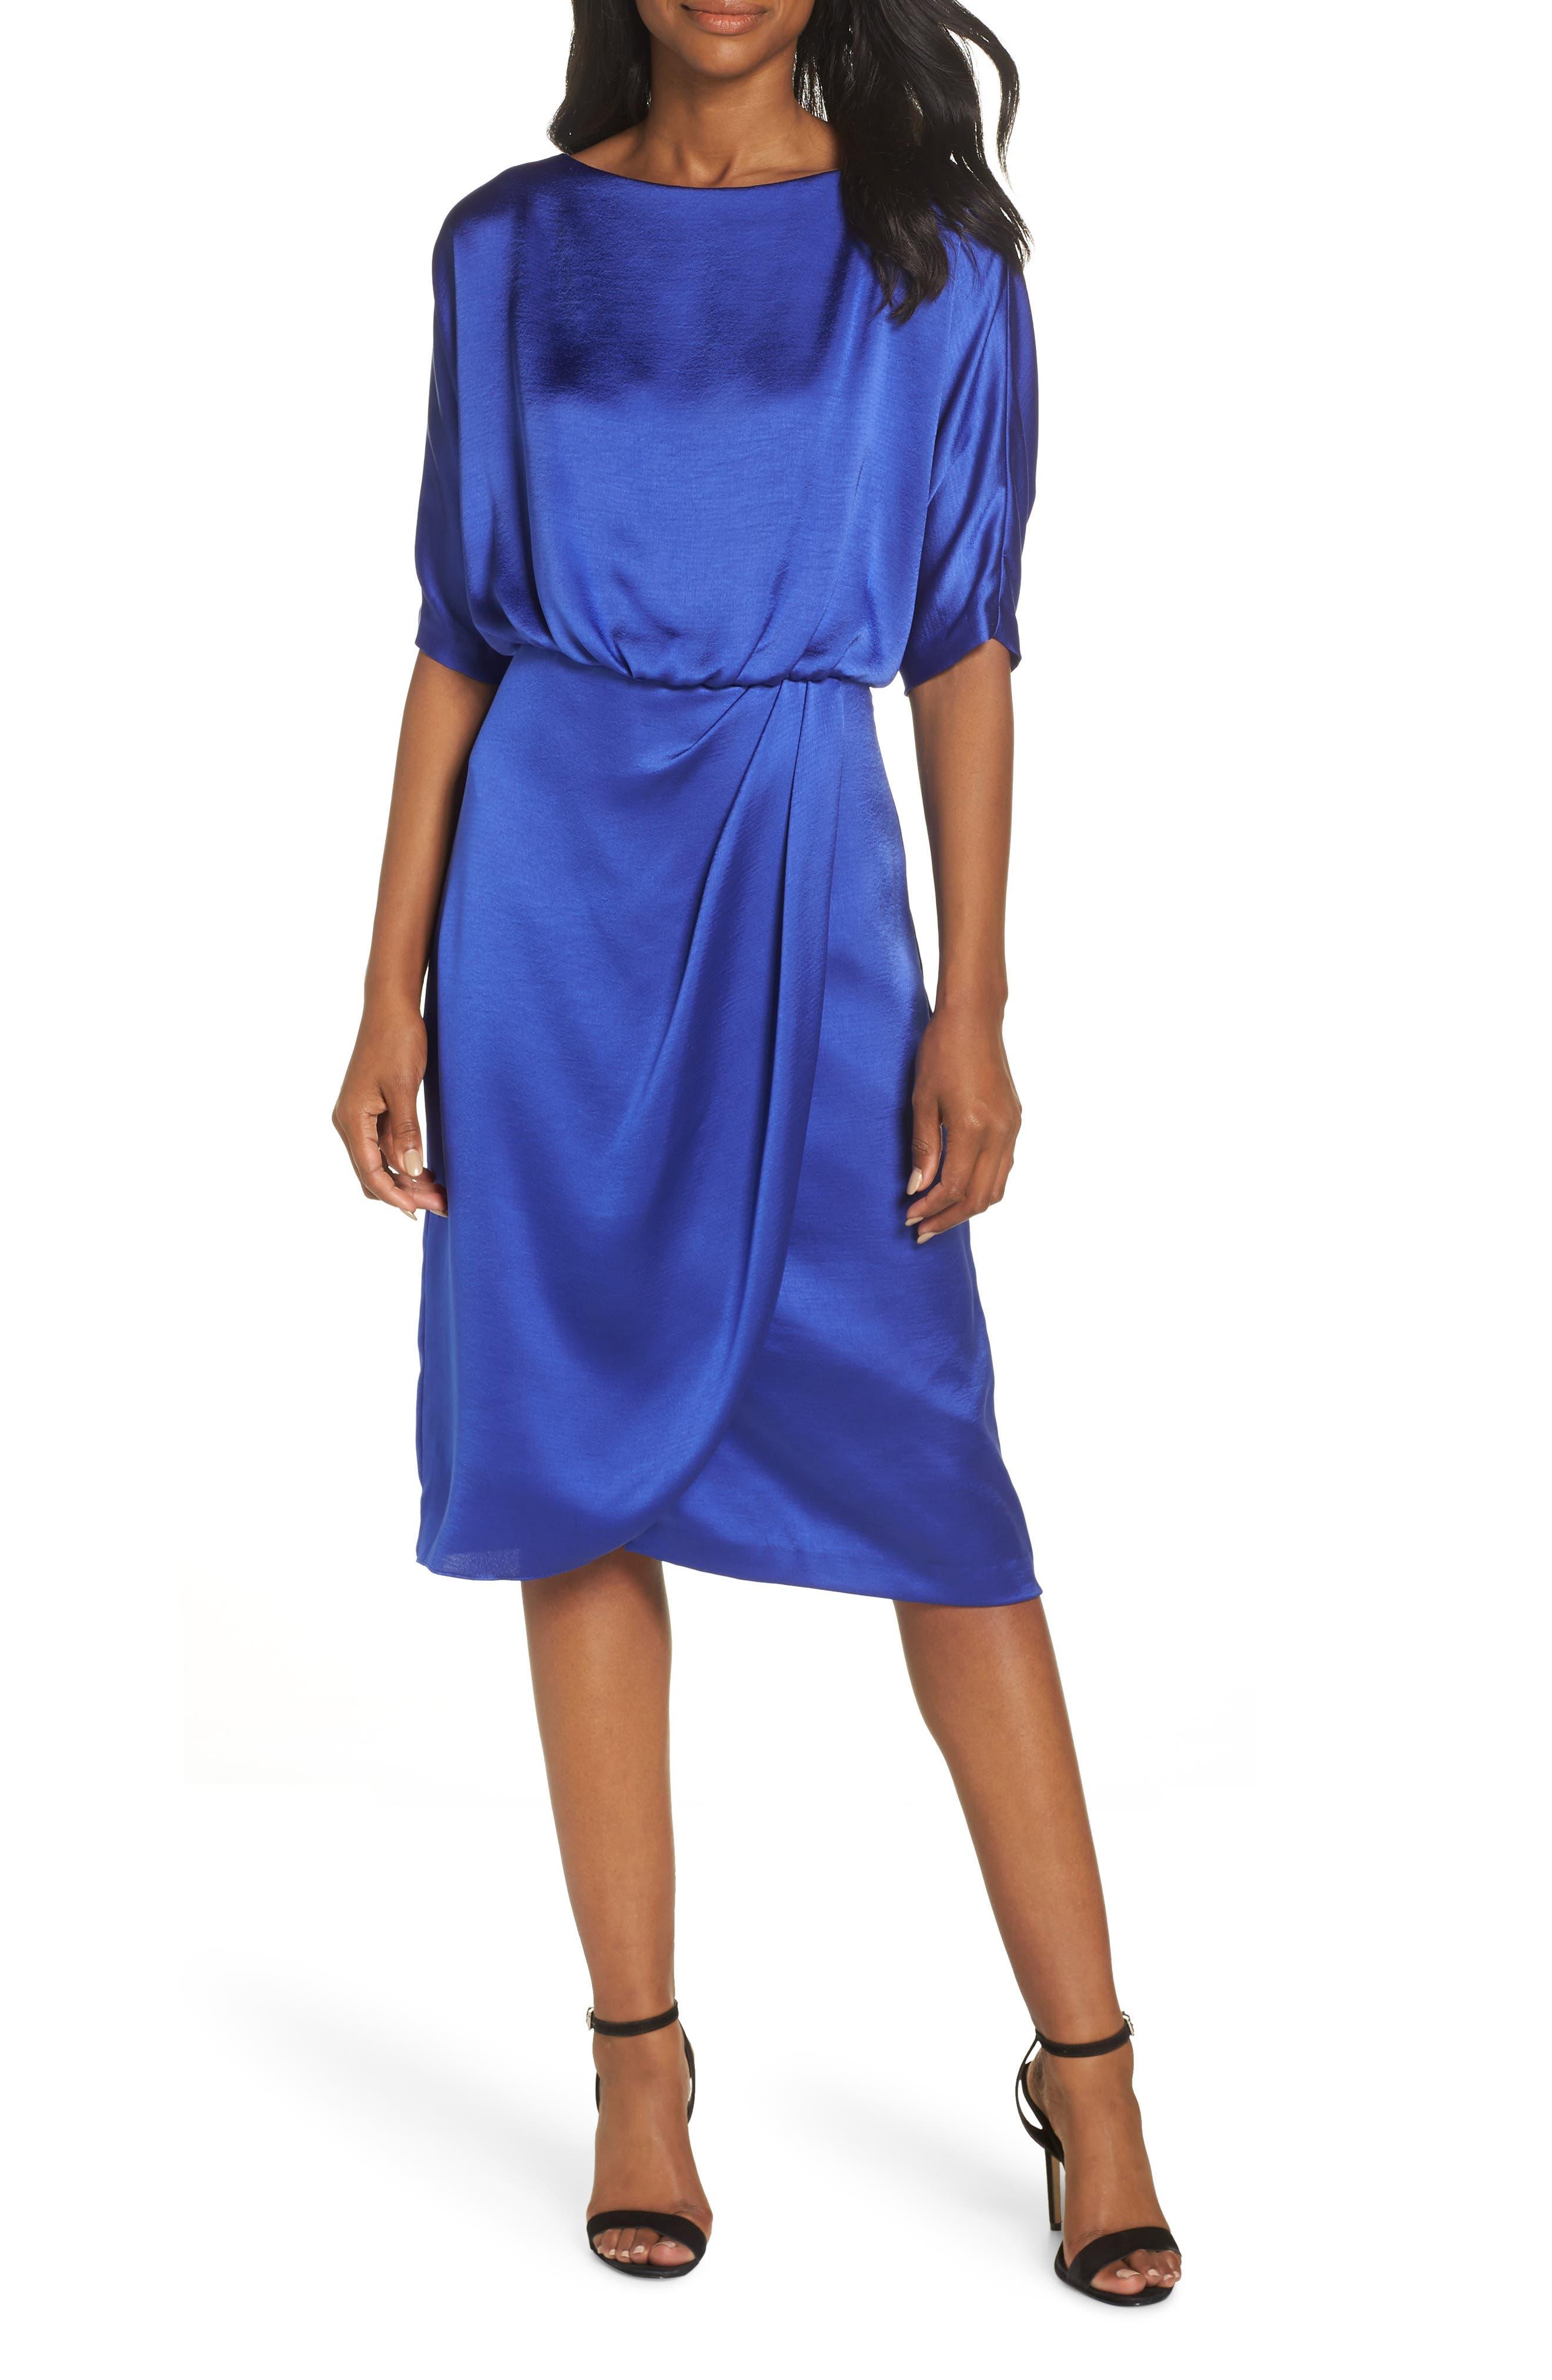 Maggy London Draped Blouson Dress, 8 (similar to 16W) - Blue